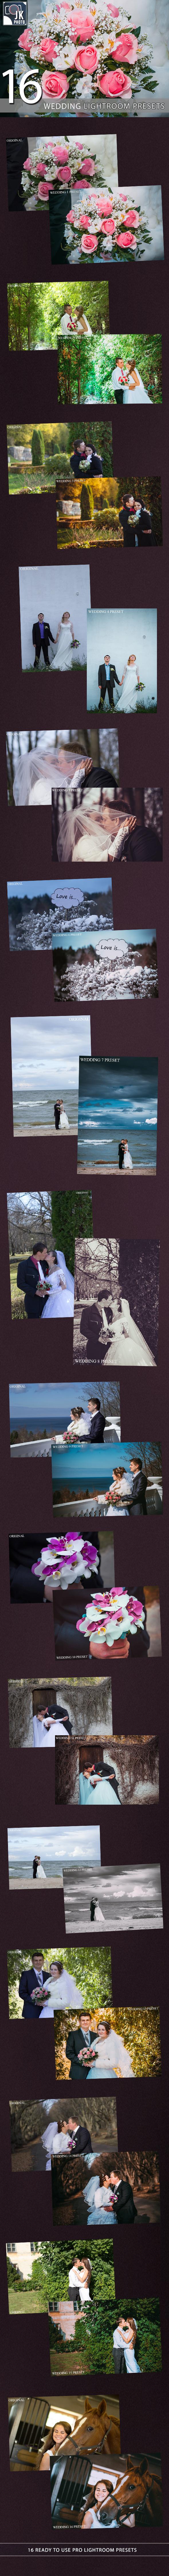 16 Wedding Premium Lightroom Presets - Wedding Lightroom Presets